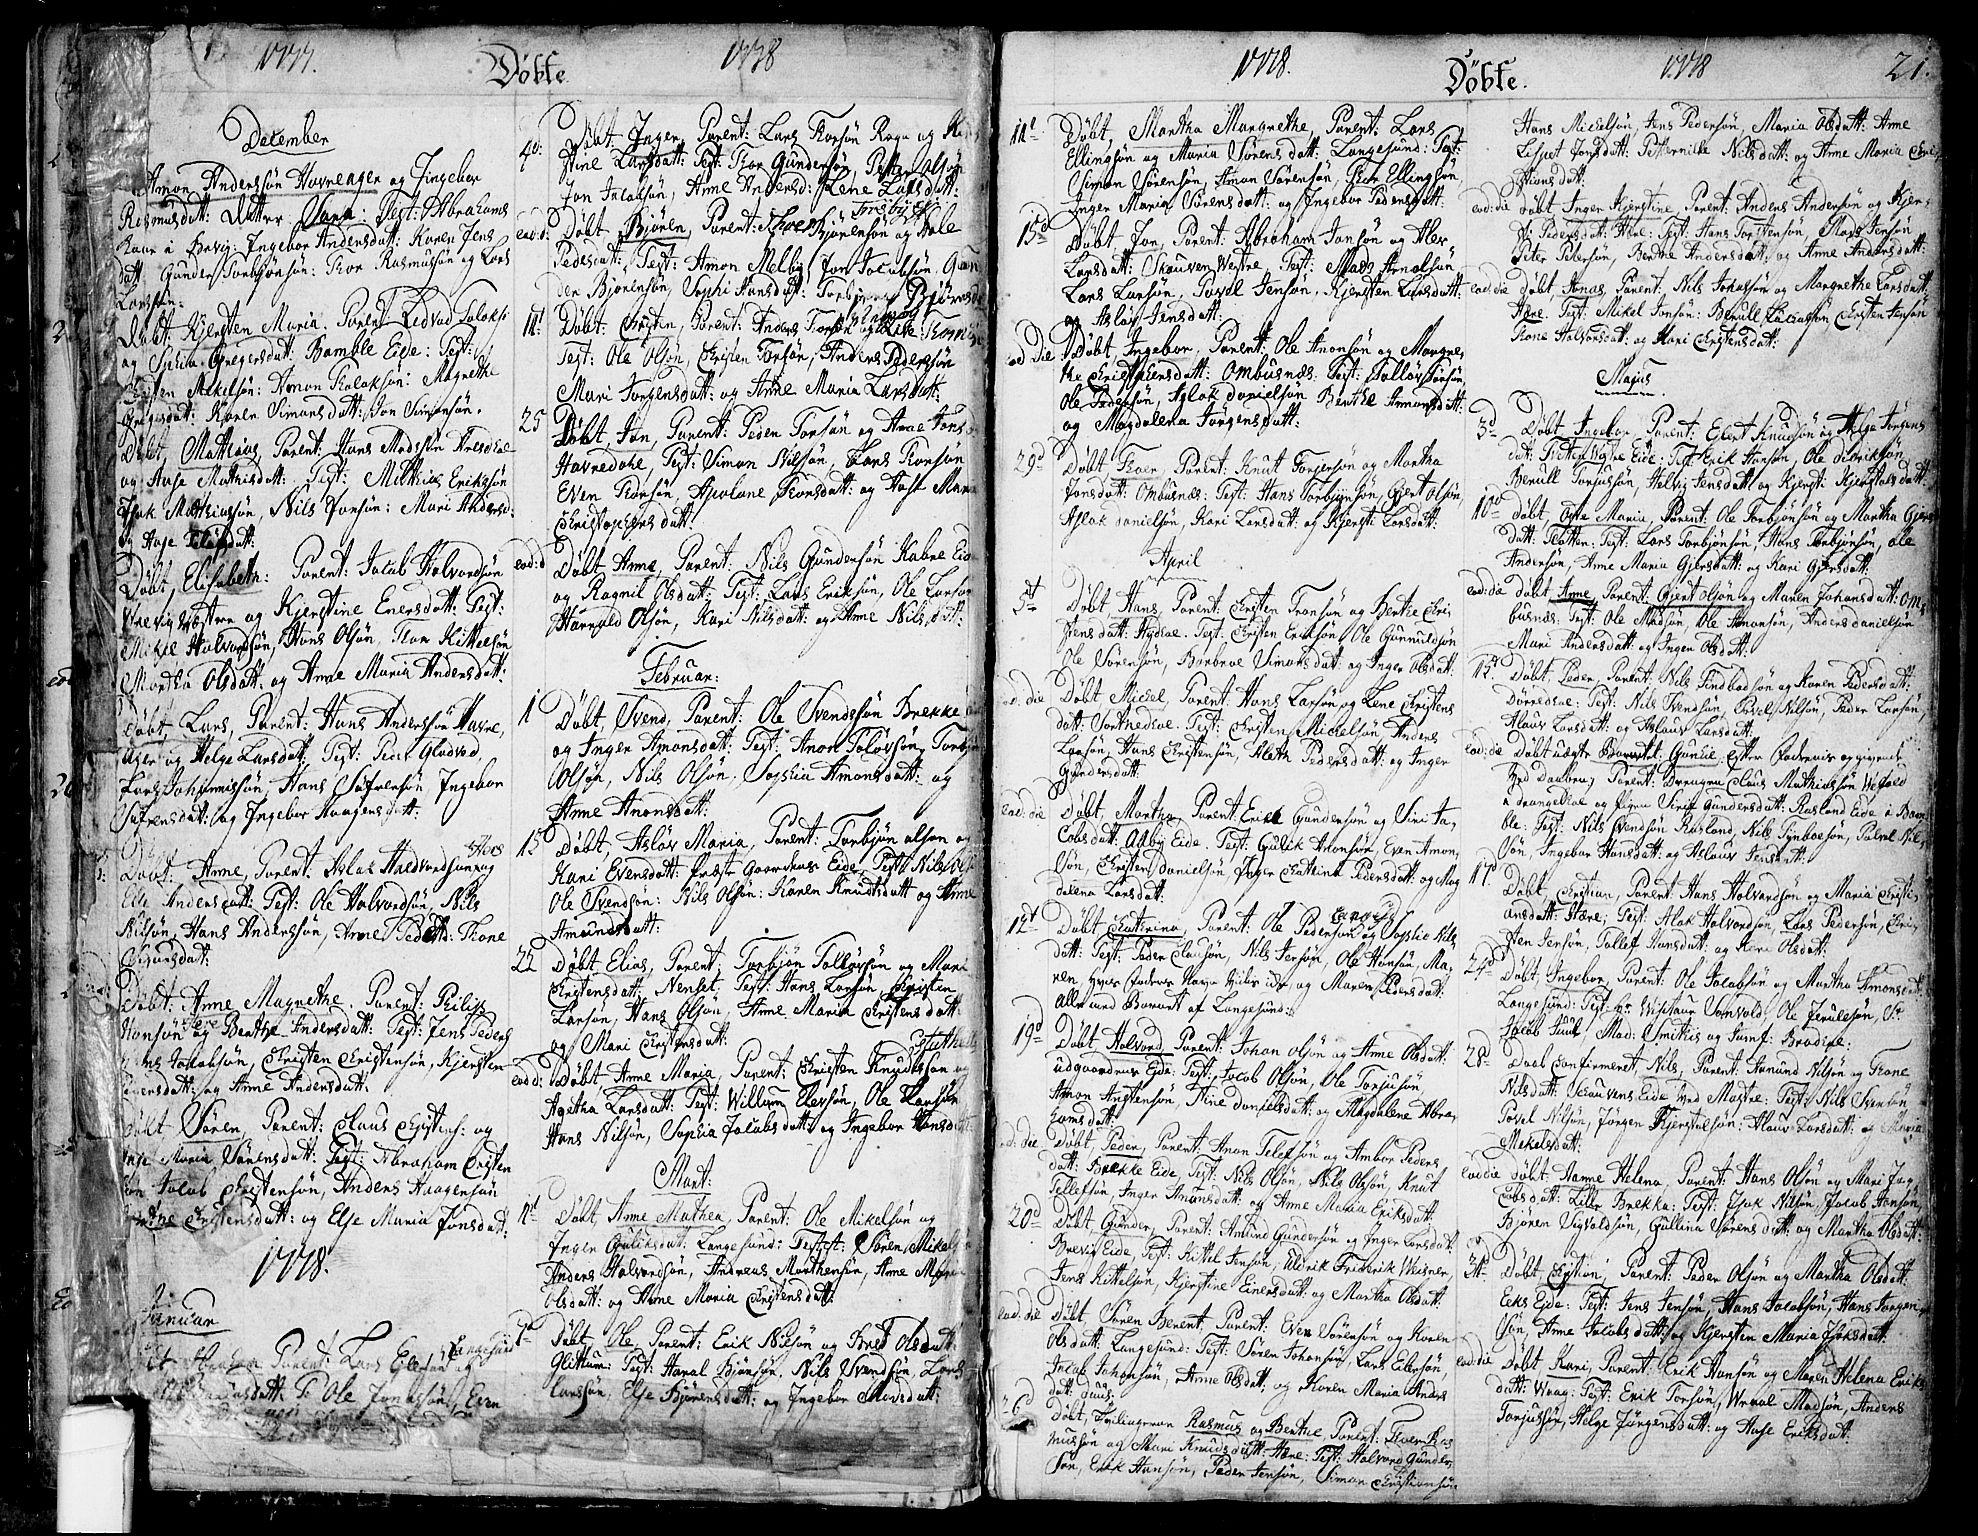 SAKO, Bamble kirkebøker, F/Fa/L0002: Ministerialbok nr. I 2, 1775-1814, s. 20-21